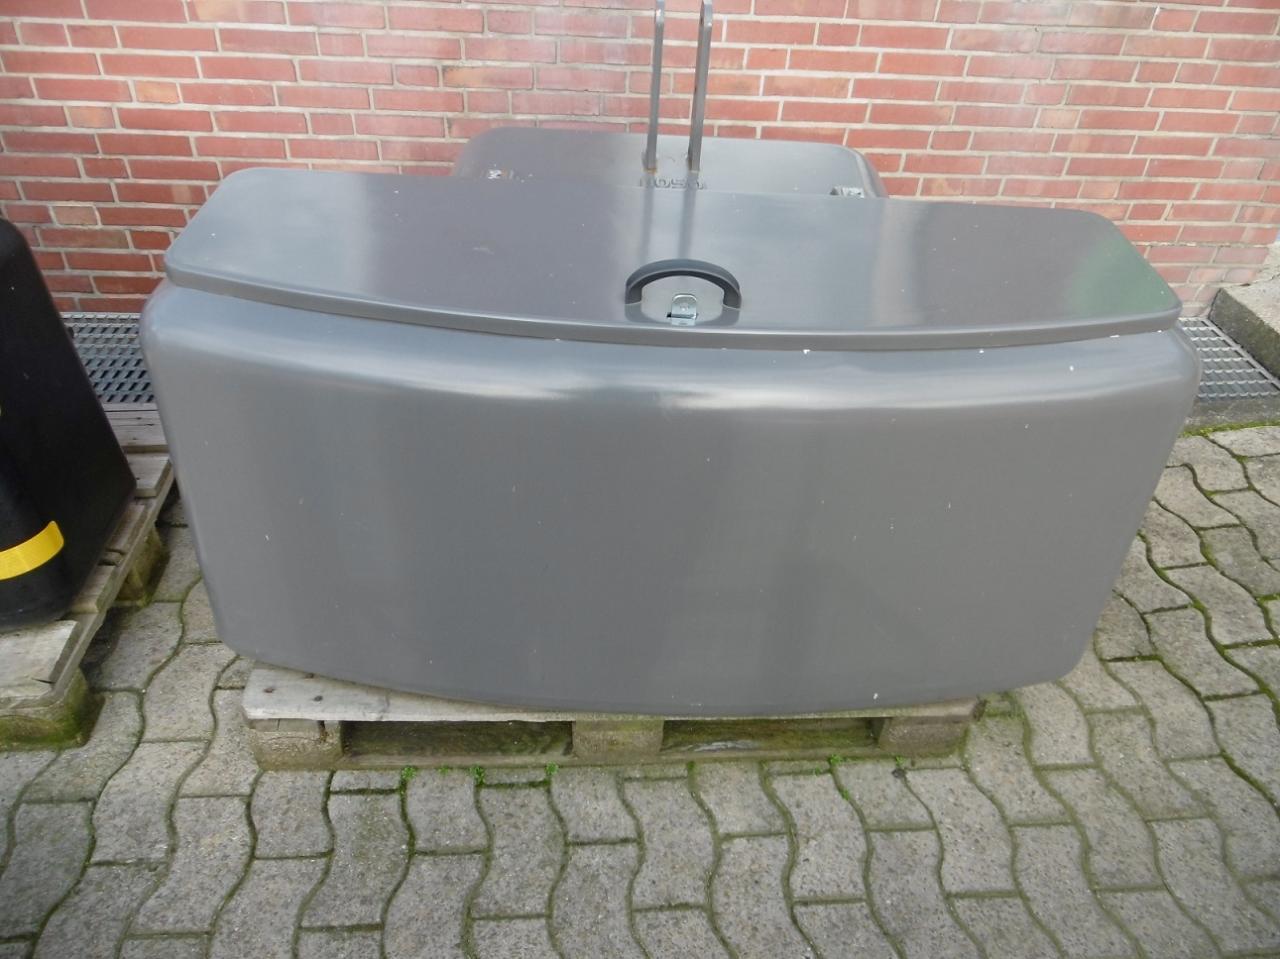 Deutz-Fahr Eco Box 1050 Kg